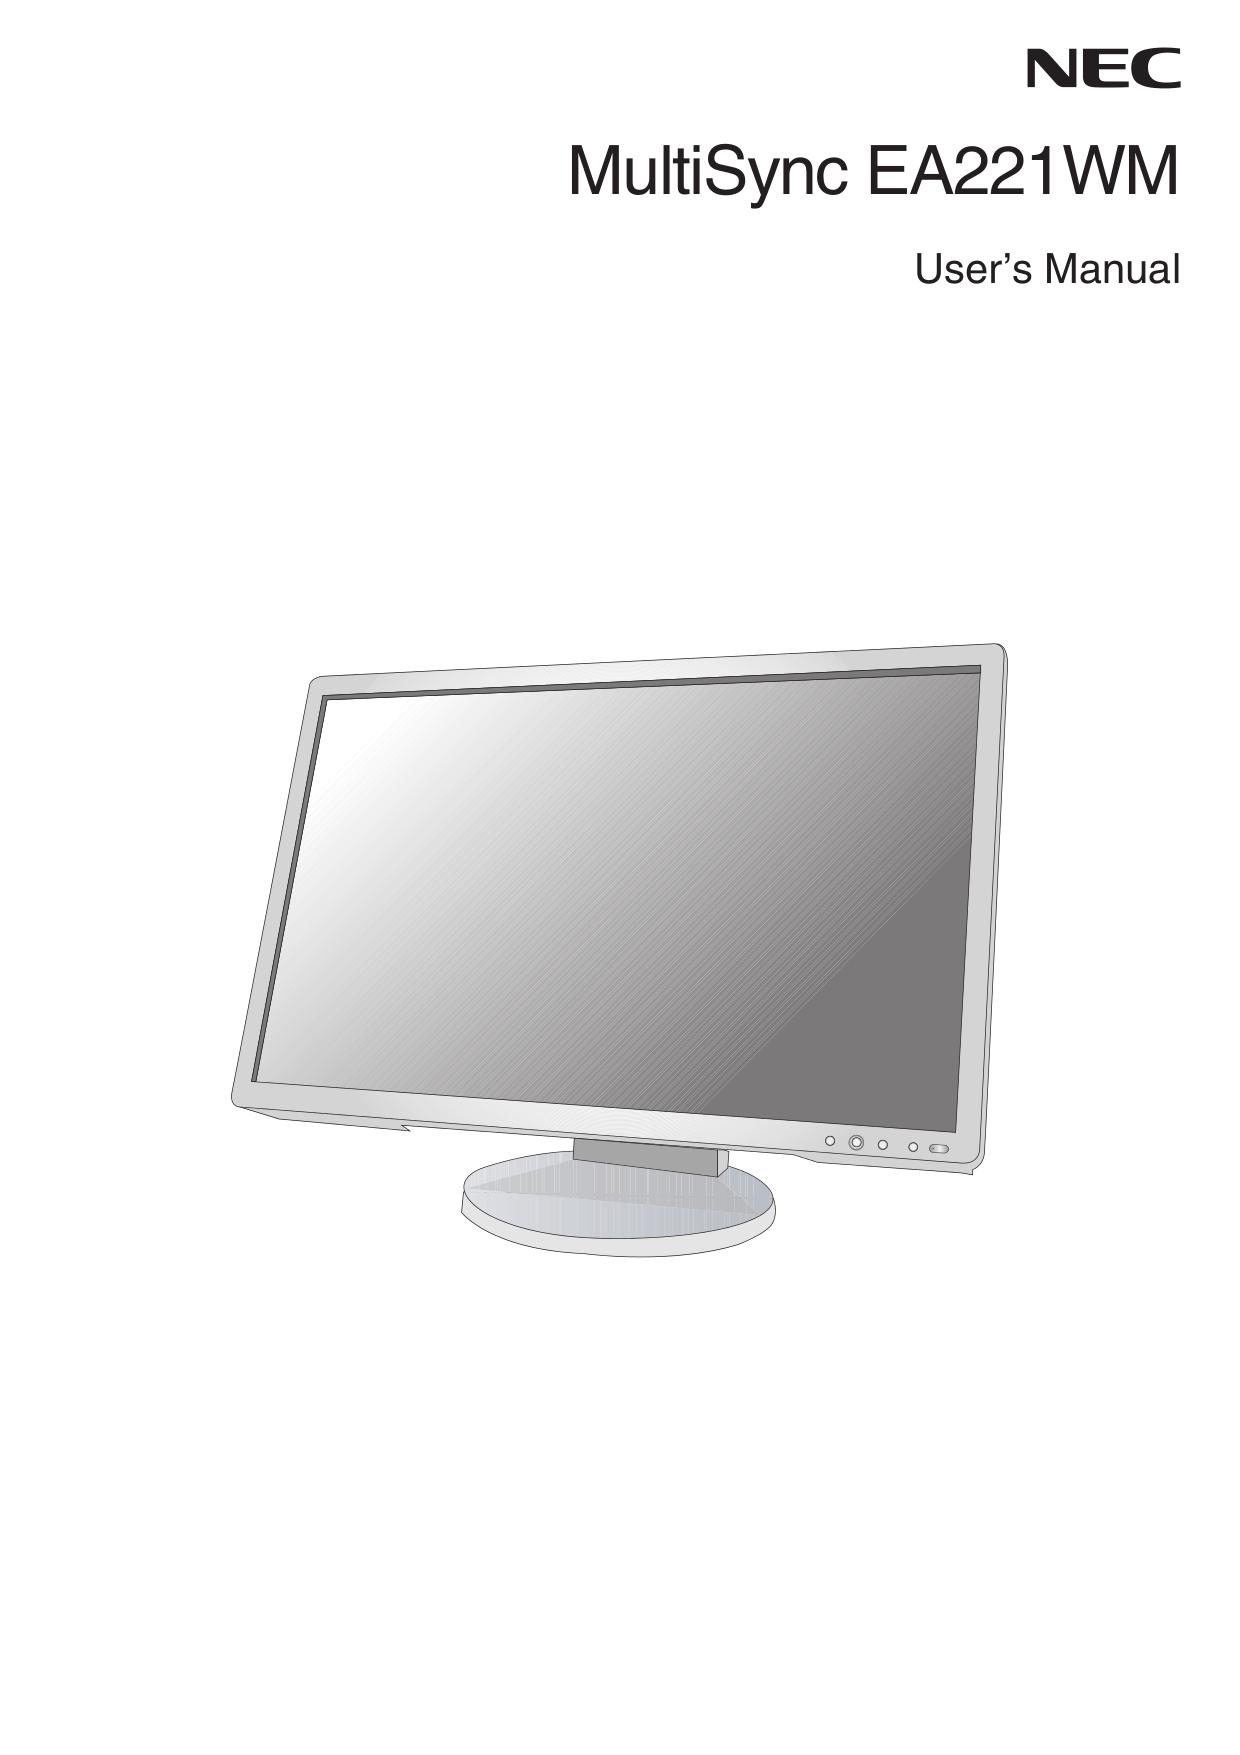 univerge sv9100 user manual Array - download free pdf for nec multisync  ea221wm monitor manual rh umlib com